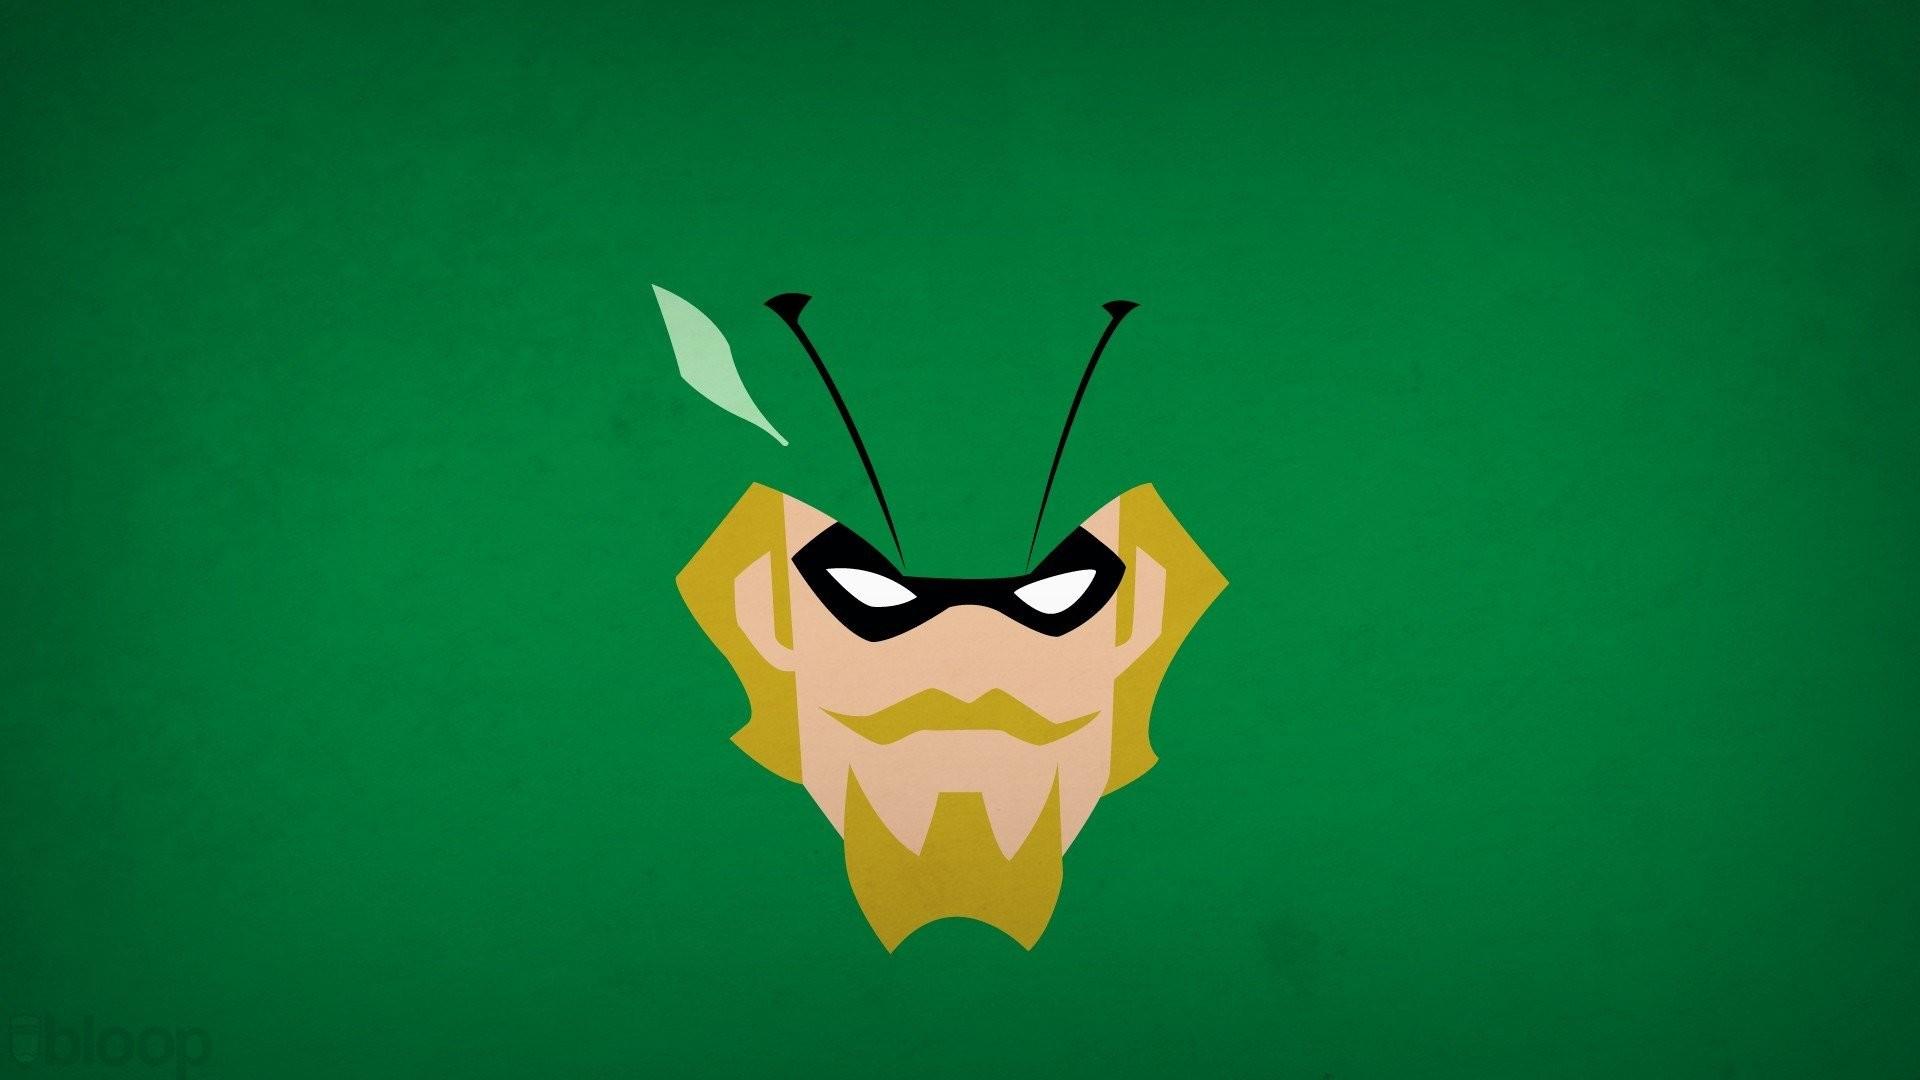 DC Comics Minimalism Simple Background Superheroes Green Arrow